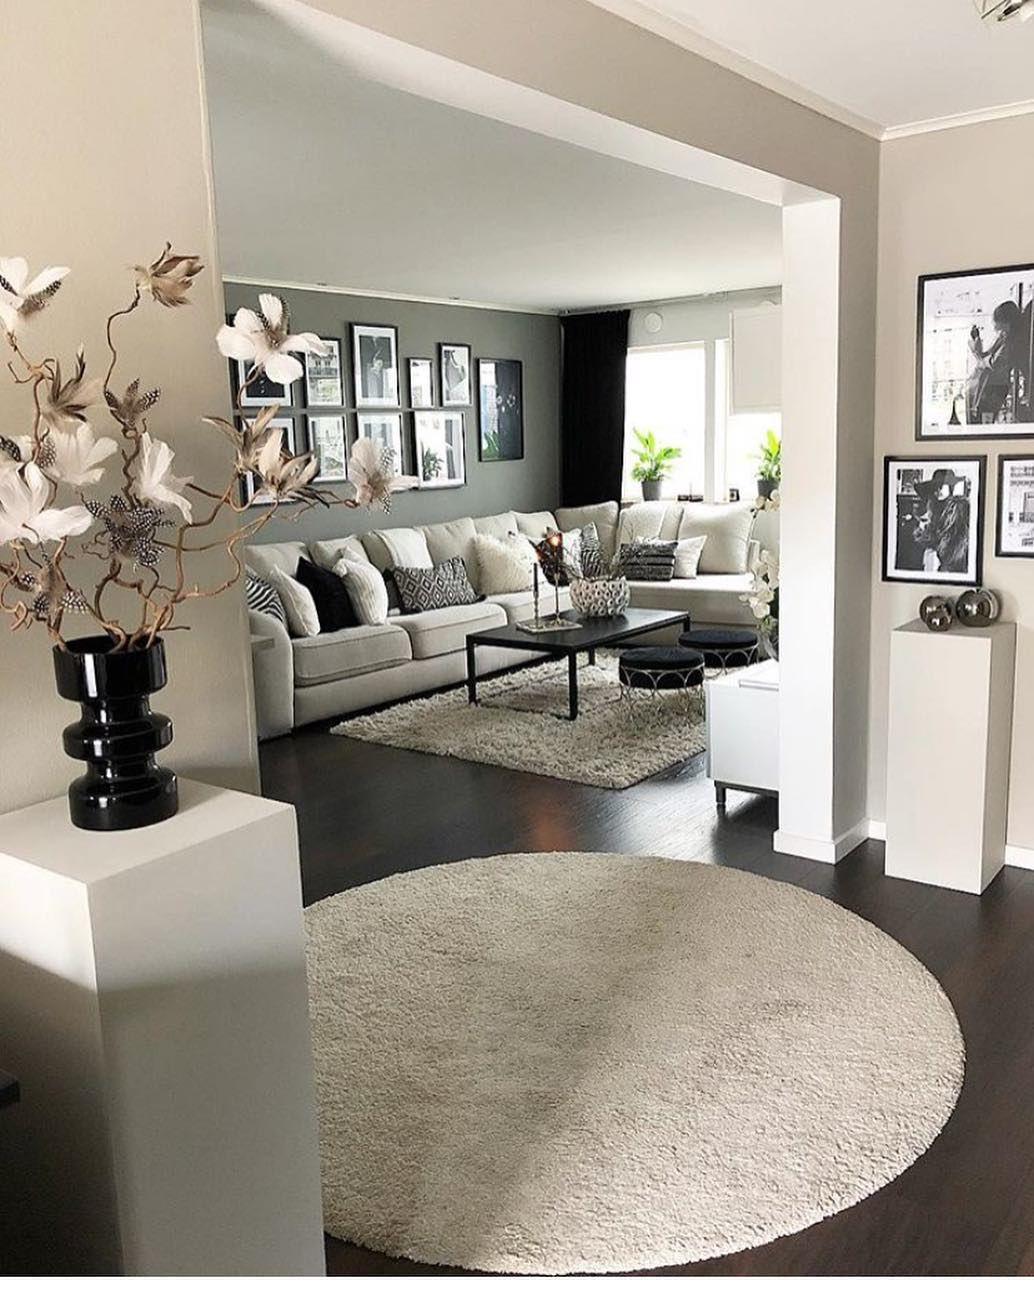 Really Nice Interior Modern And Stylish Interior By Maria Homedecor Luxuryhomes Livingroom Livi Living Room Decor Modern Living Room Decor Cozy Home #really #nice #living #room